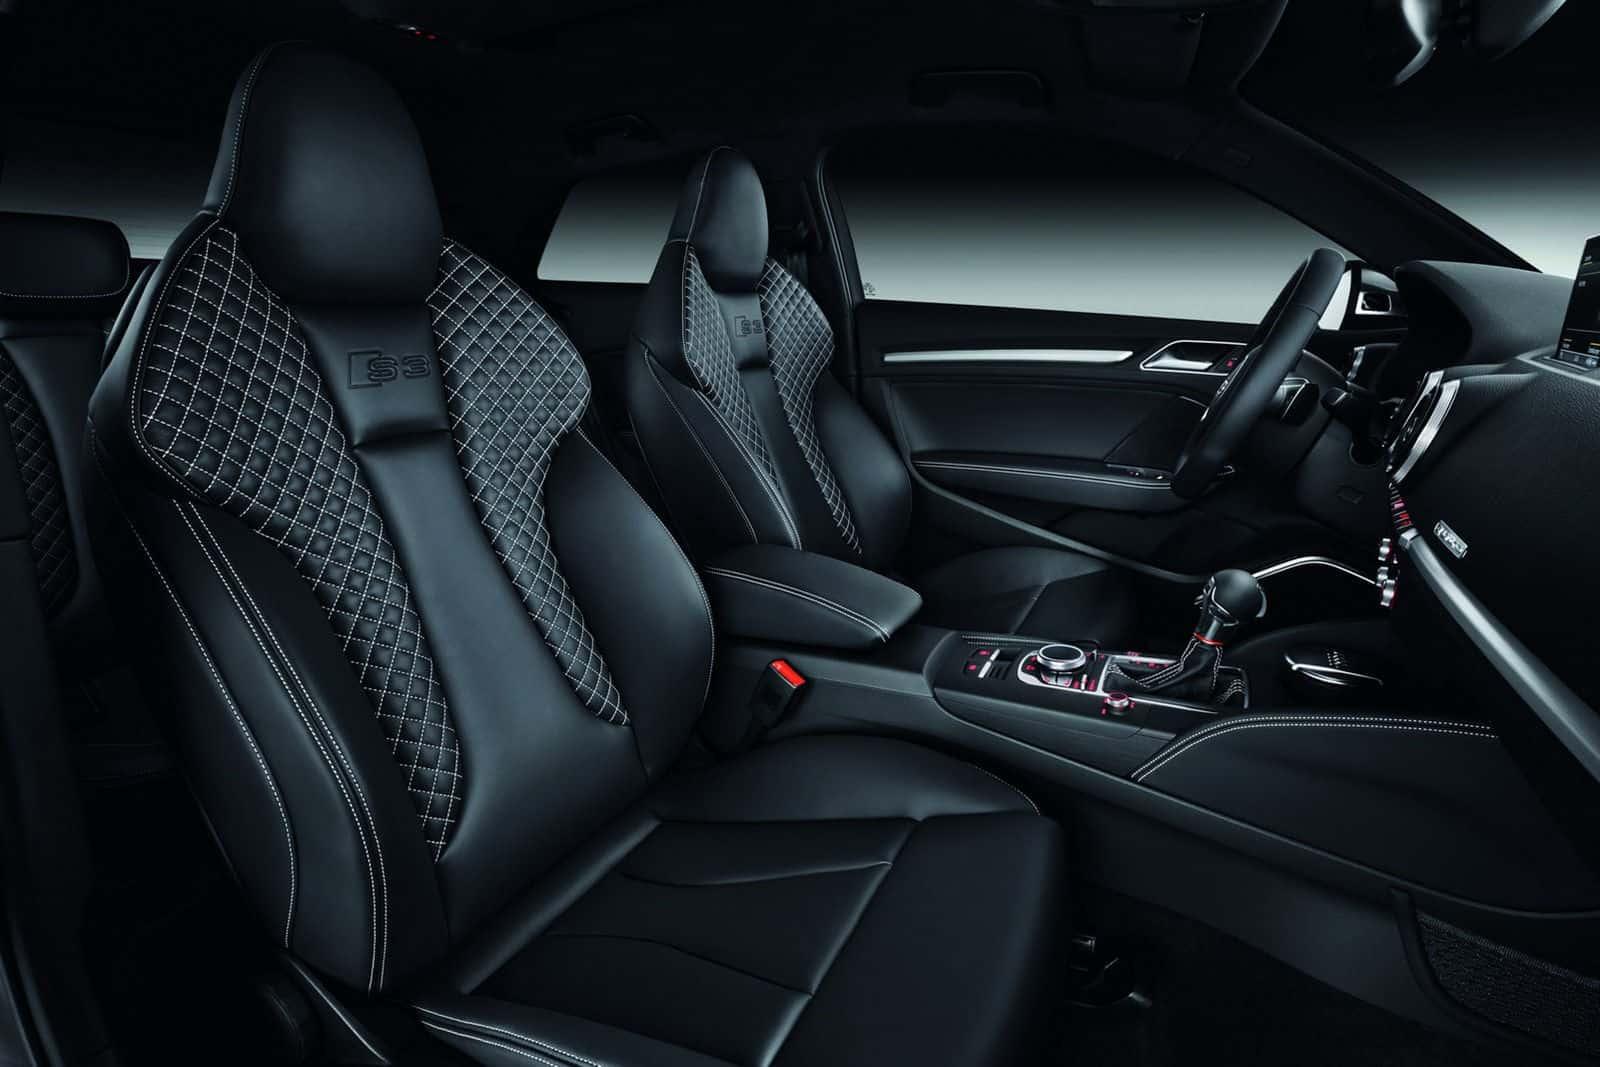 2013 Audi S3 Hatchback interior